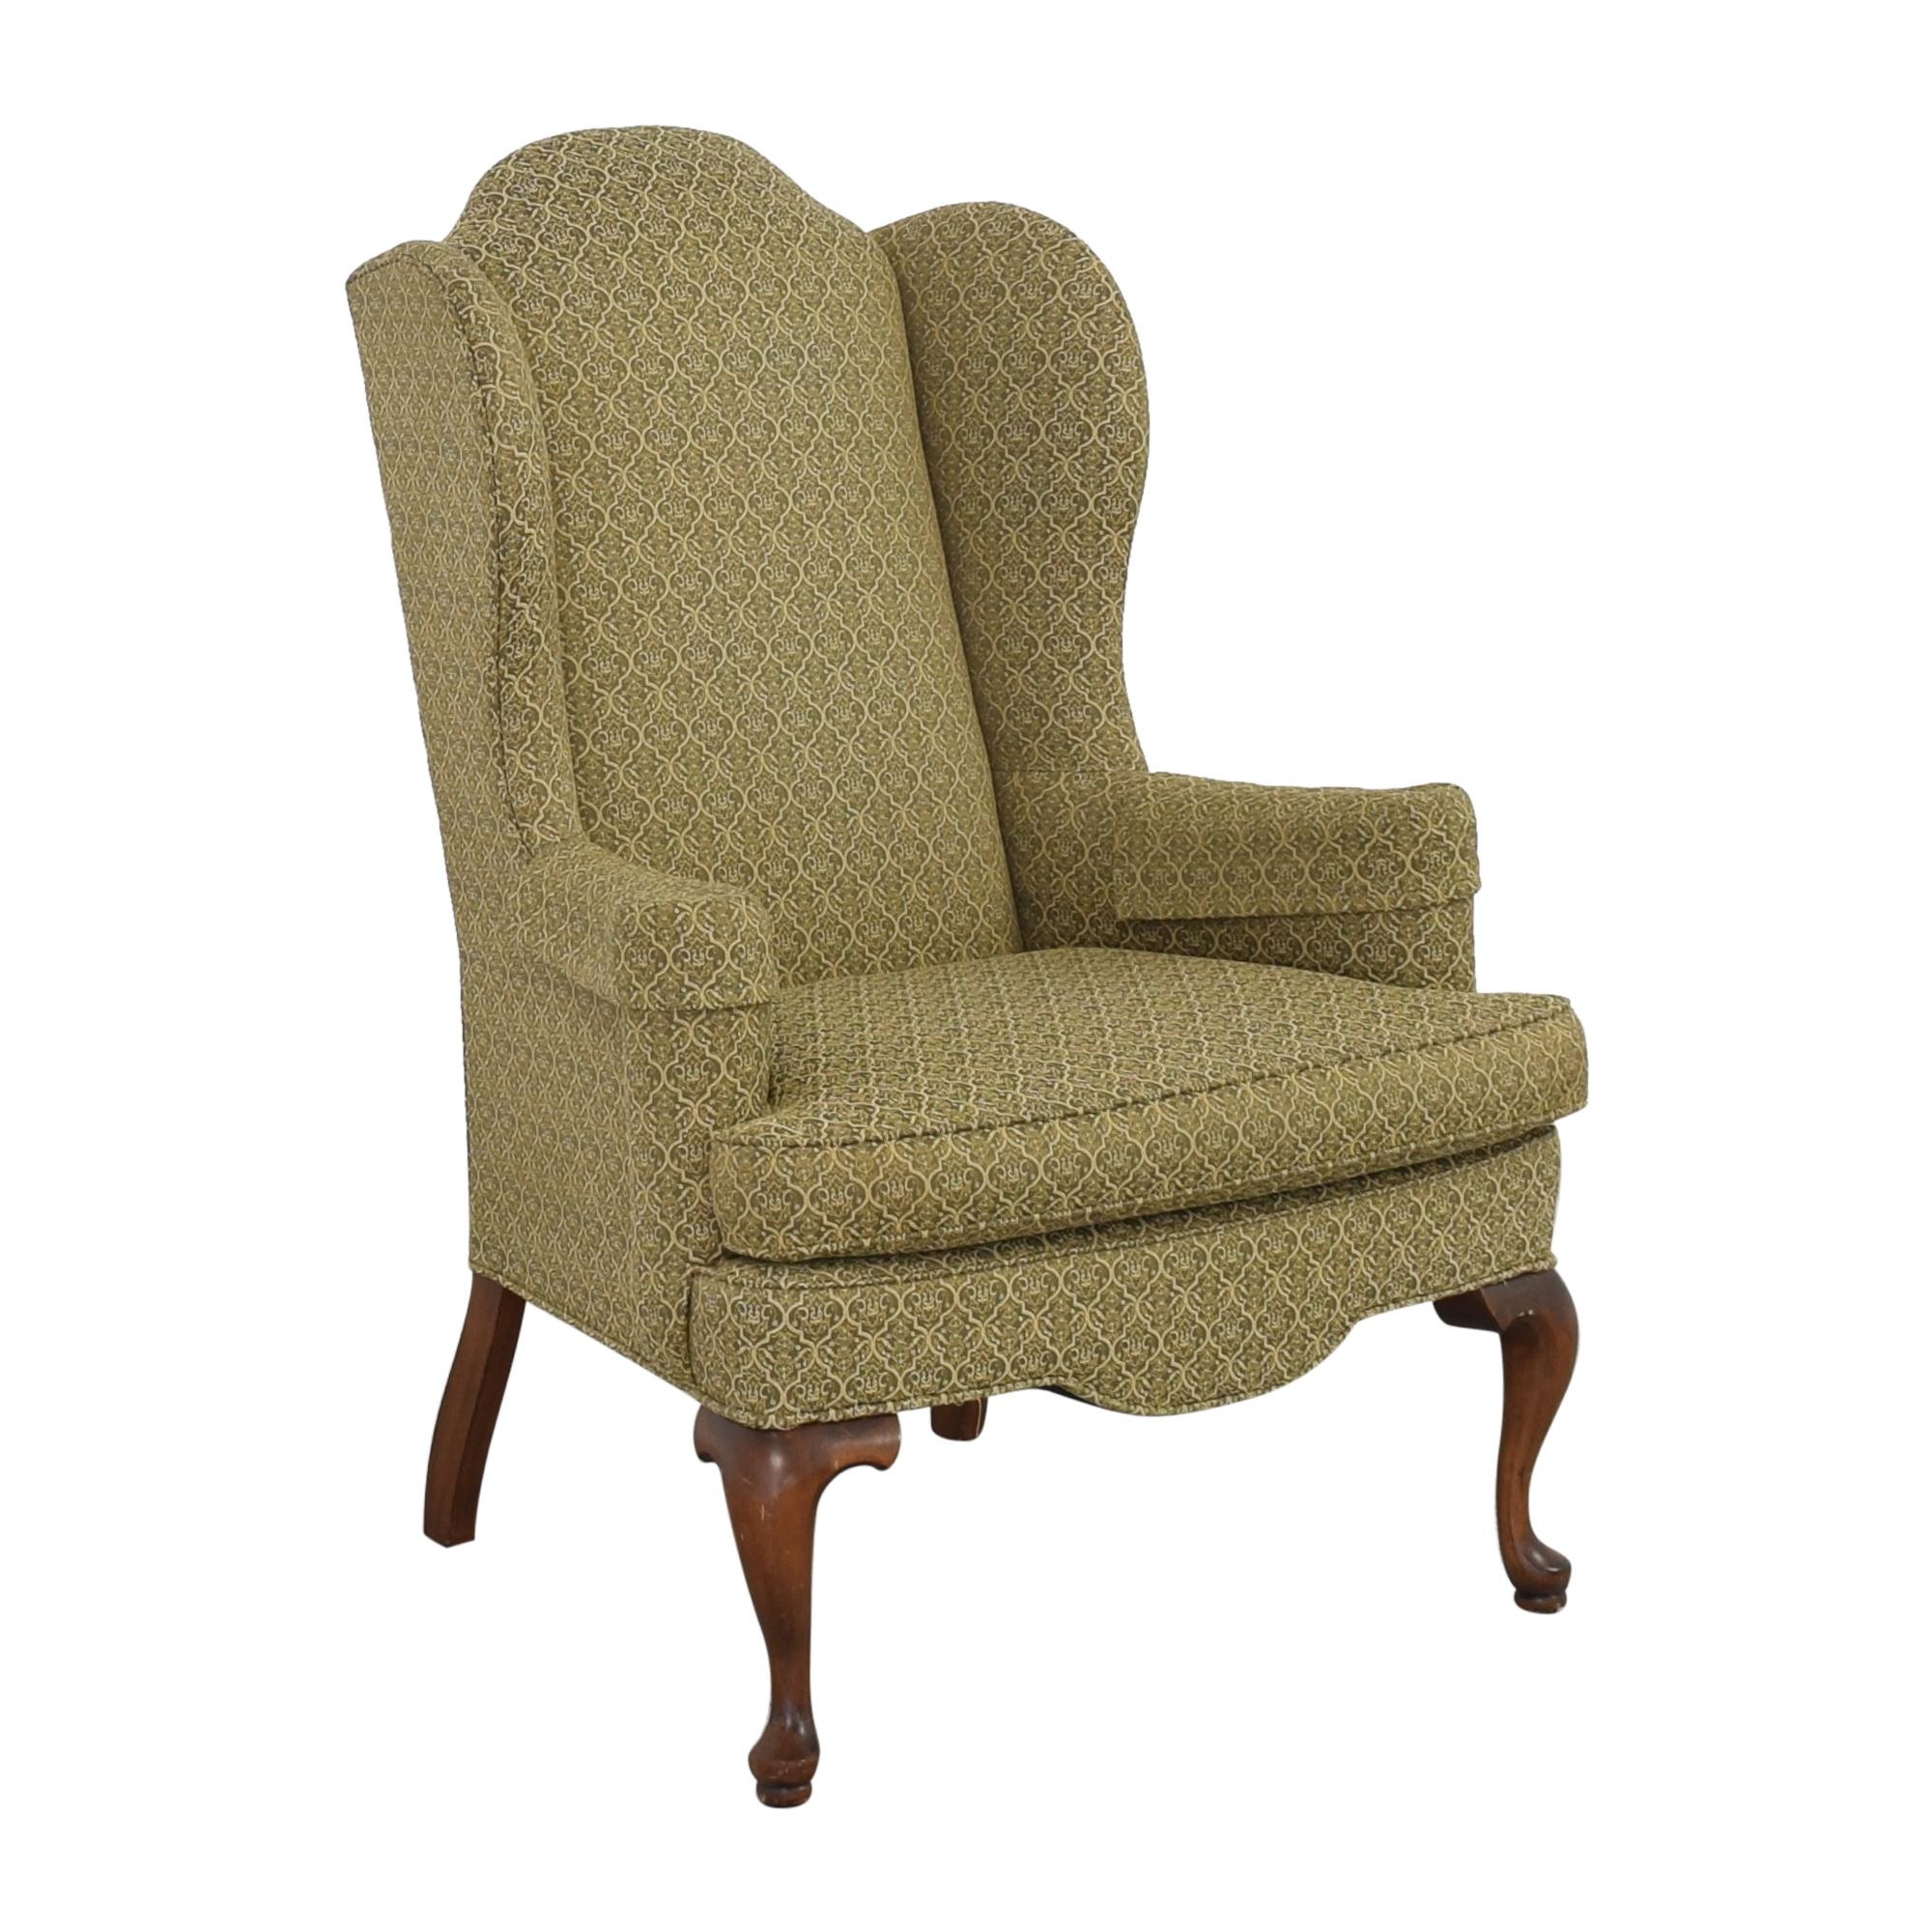 buy Ethan Allen Queen Anne Wing Chair Ethan Allen